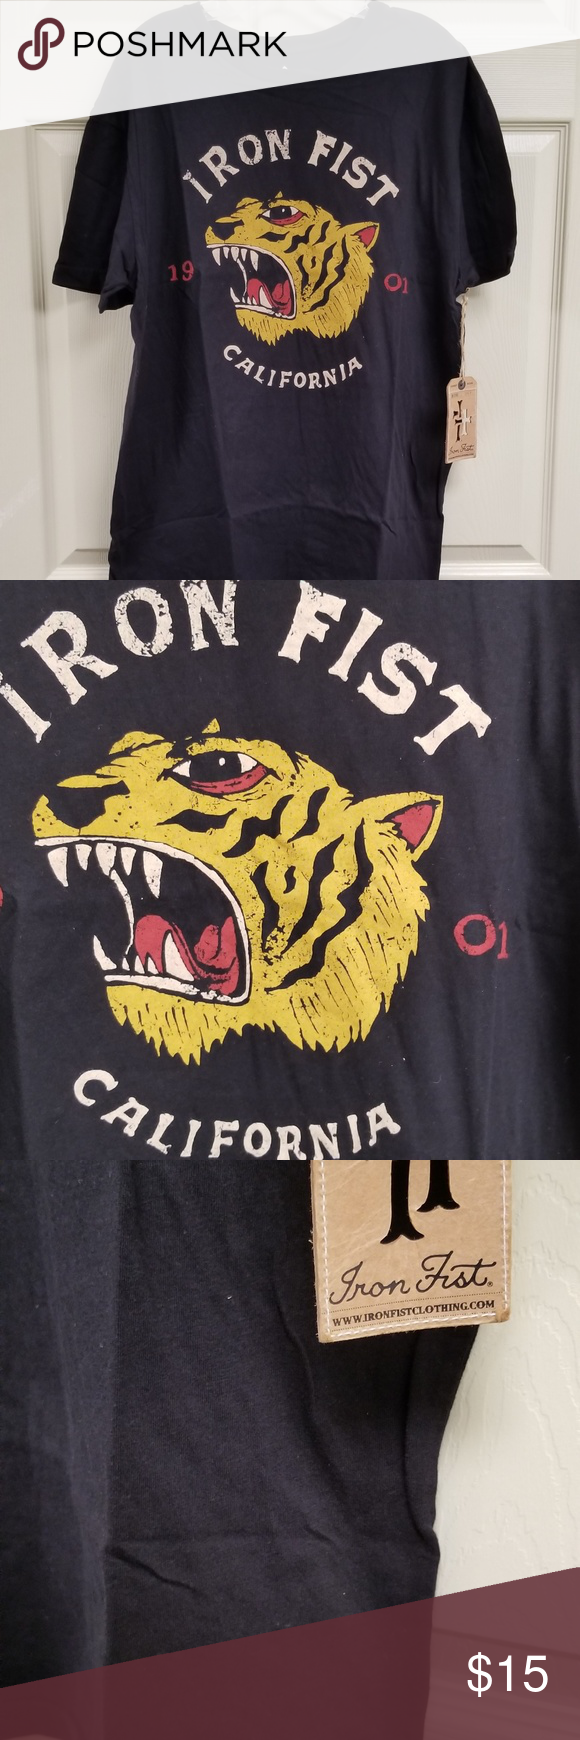 NWT Iron Fist Black California Logo Tee brand new with